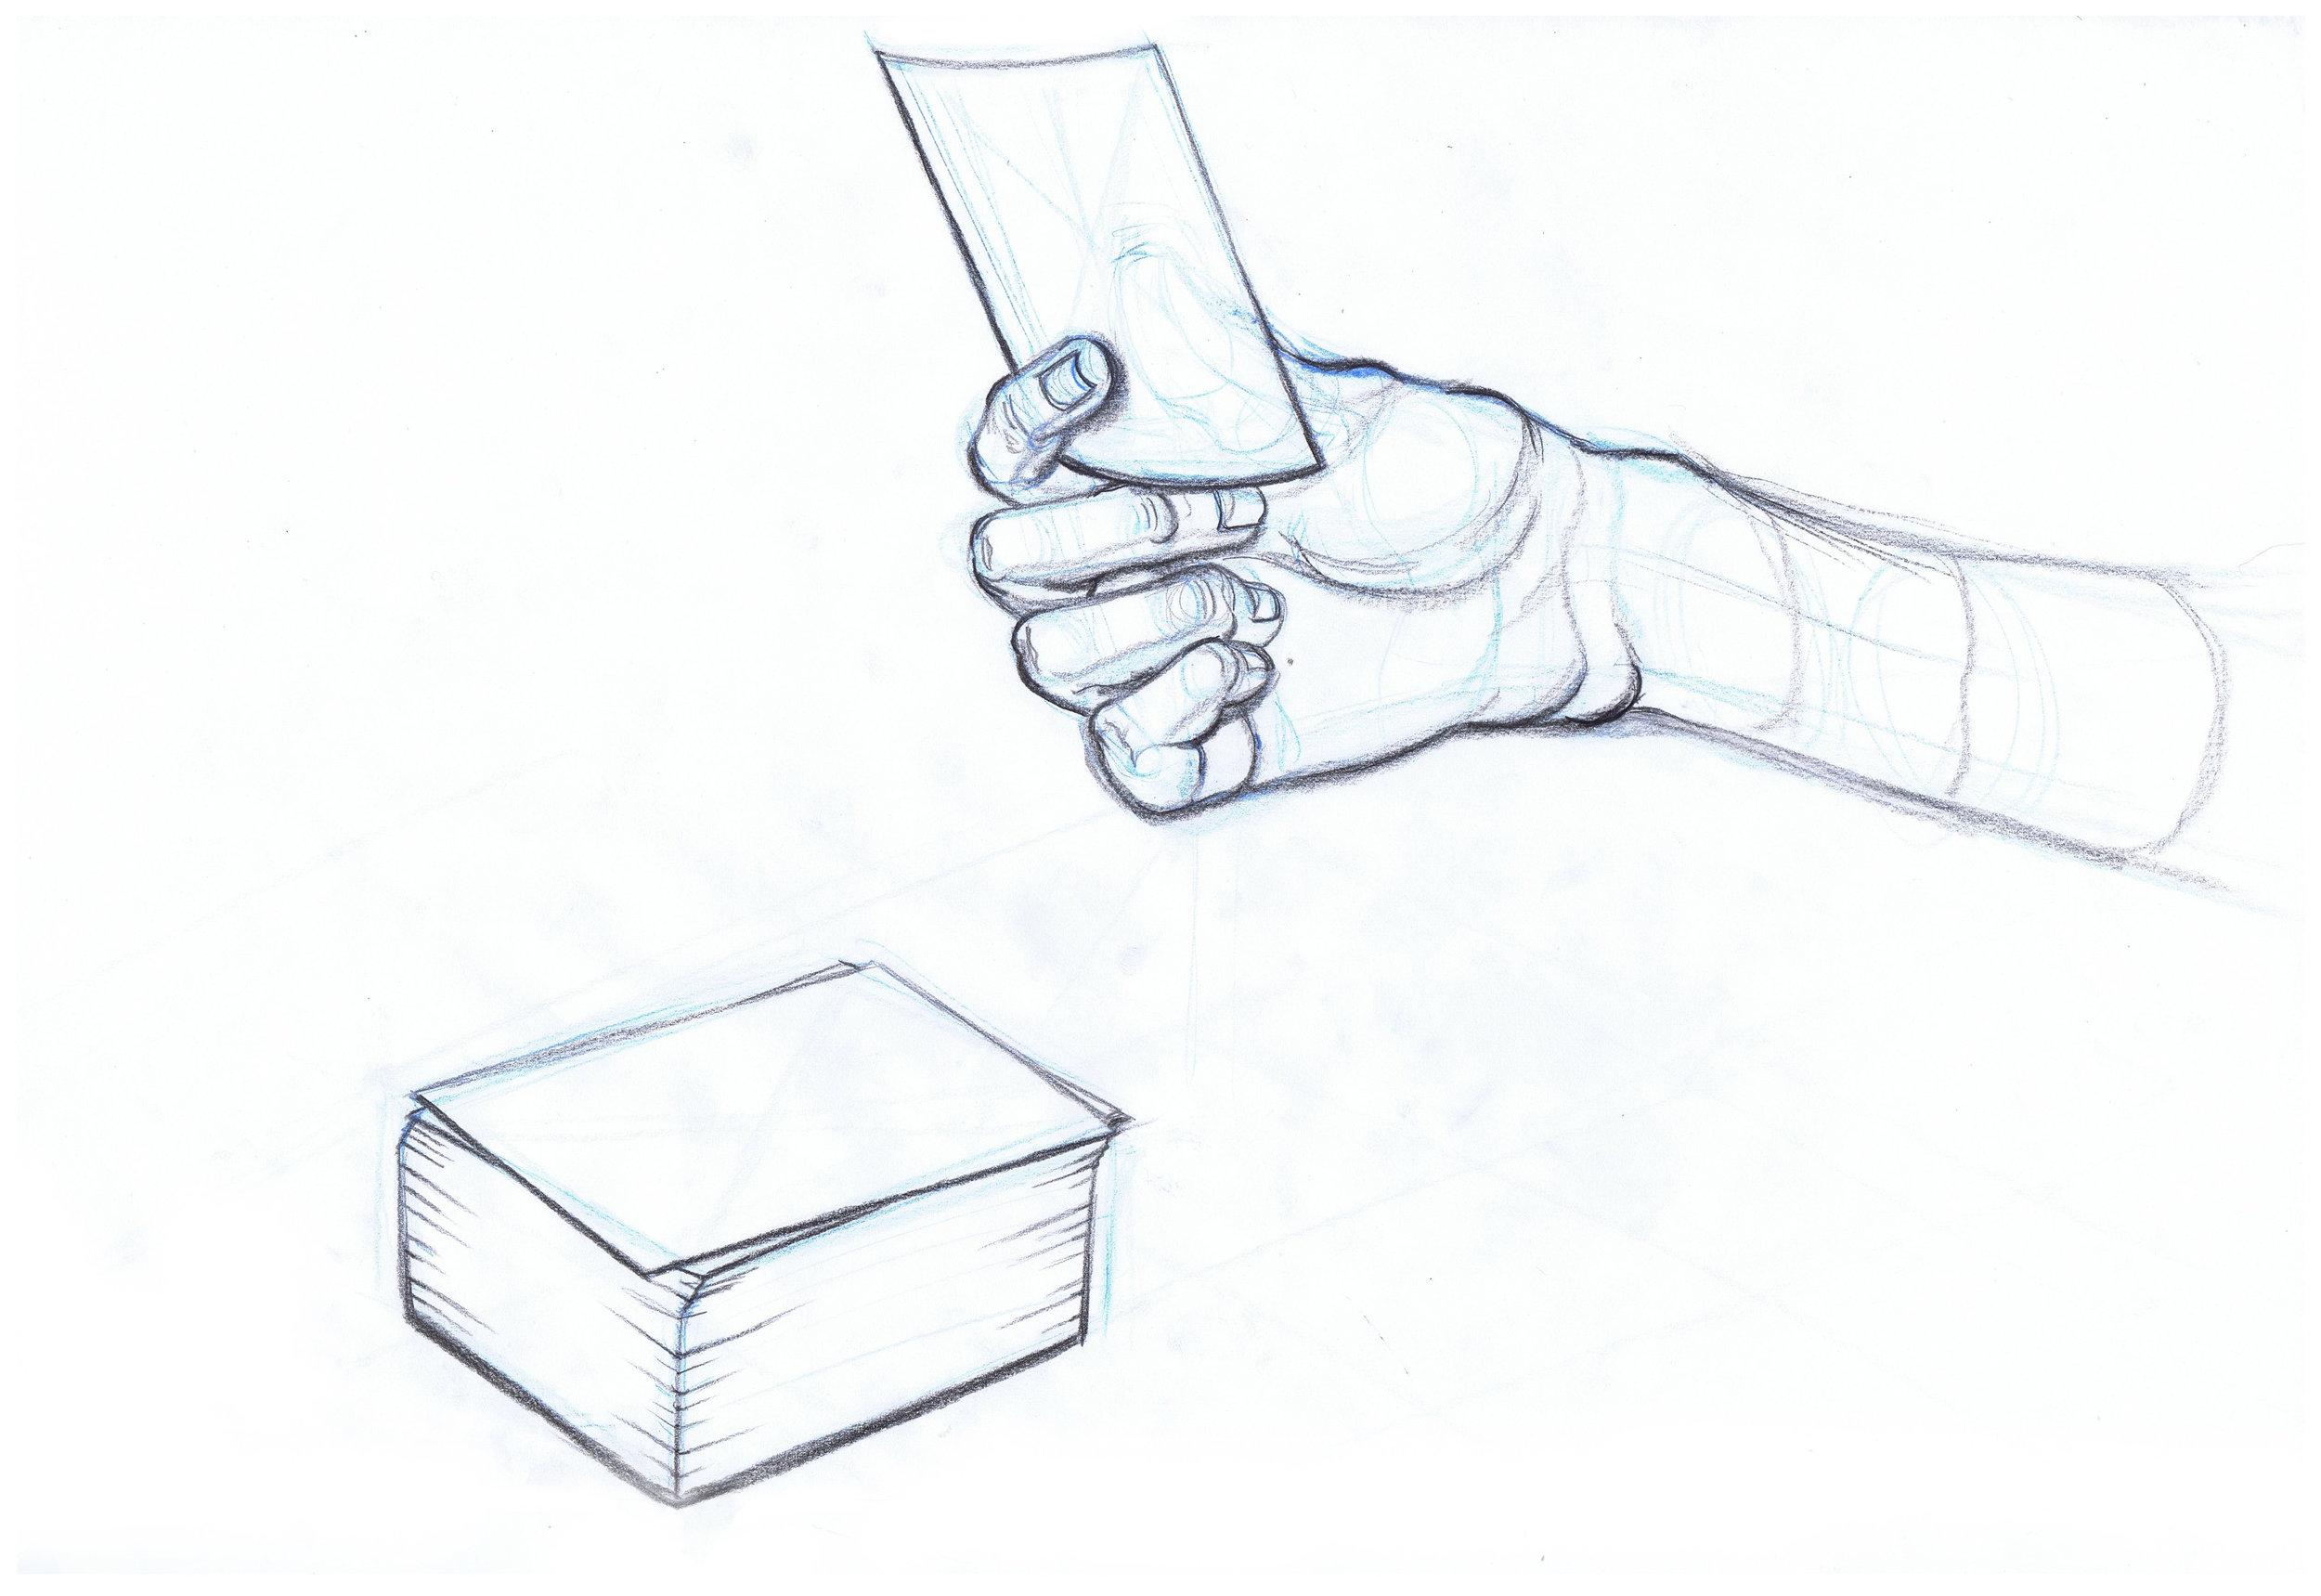 Liam_Stone_Hand_Drawing2.jpg